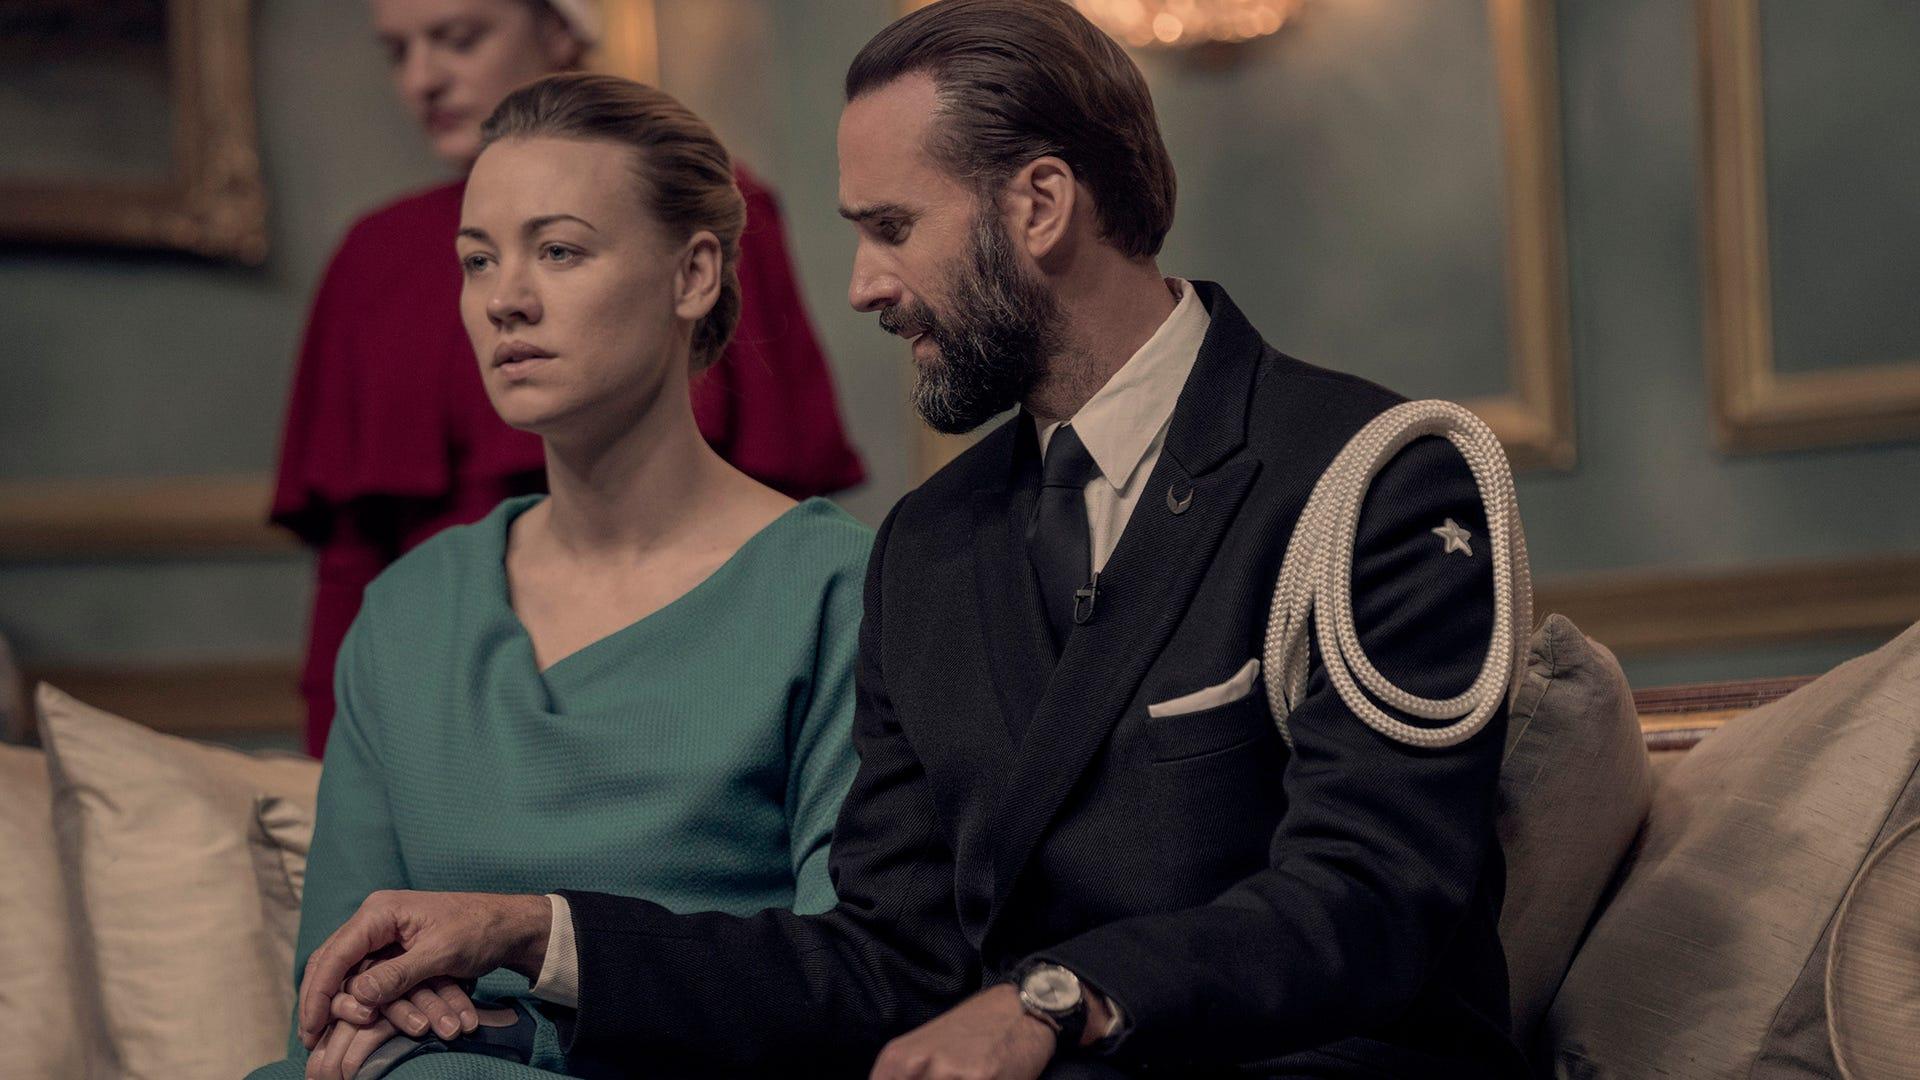 Elisabeth Moss, Yvonne Strahovski, and Joseph Fiennes, The Handmaid's Tale